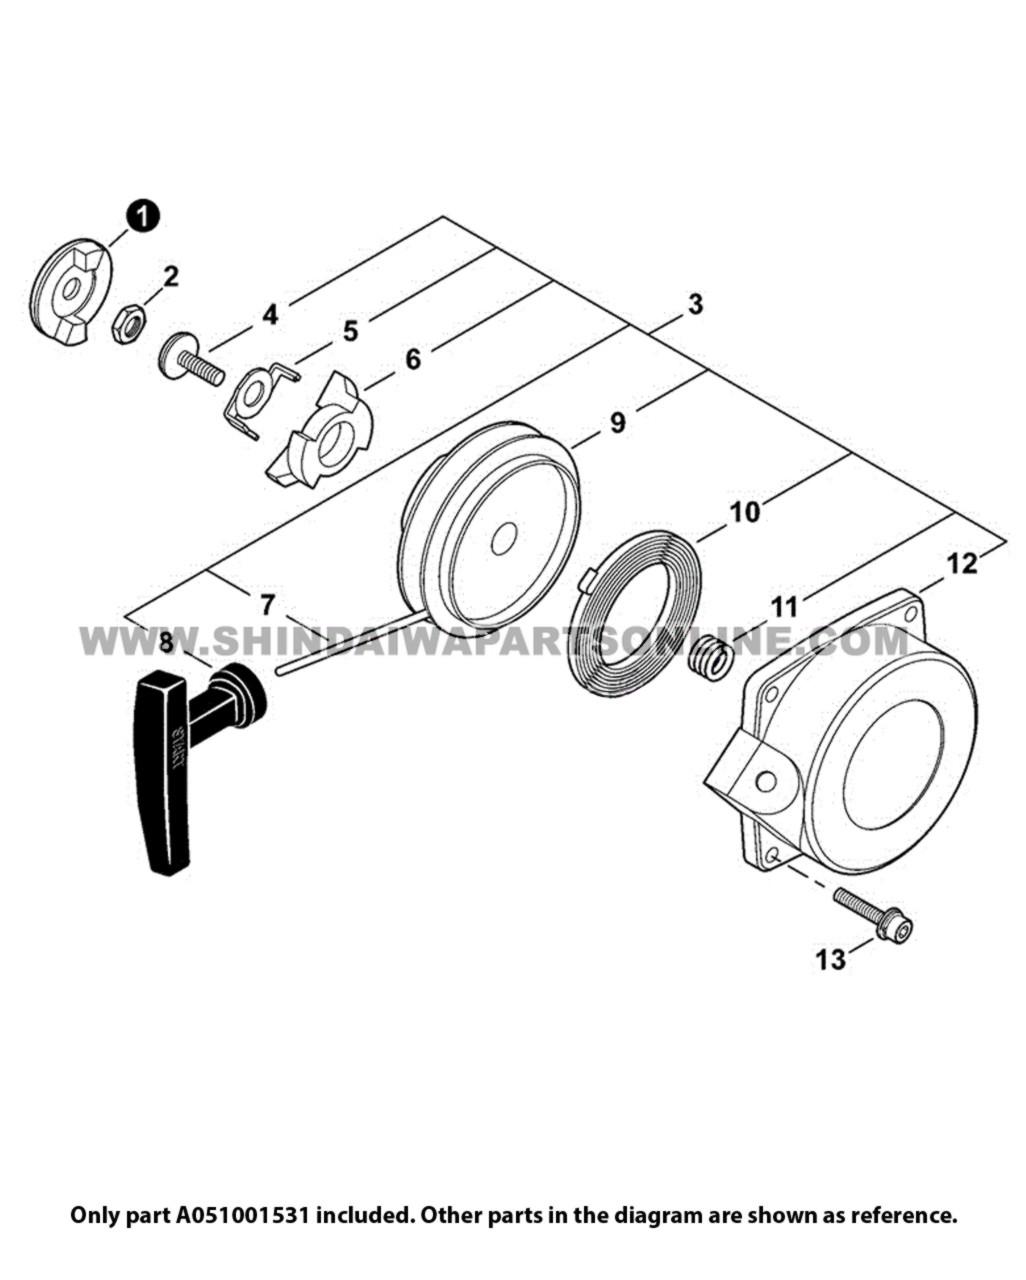 Parts lookup Shindaiwa EB802RT Starter A051001531 OEM diagram